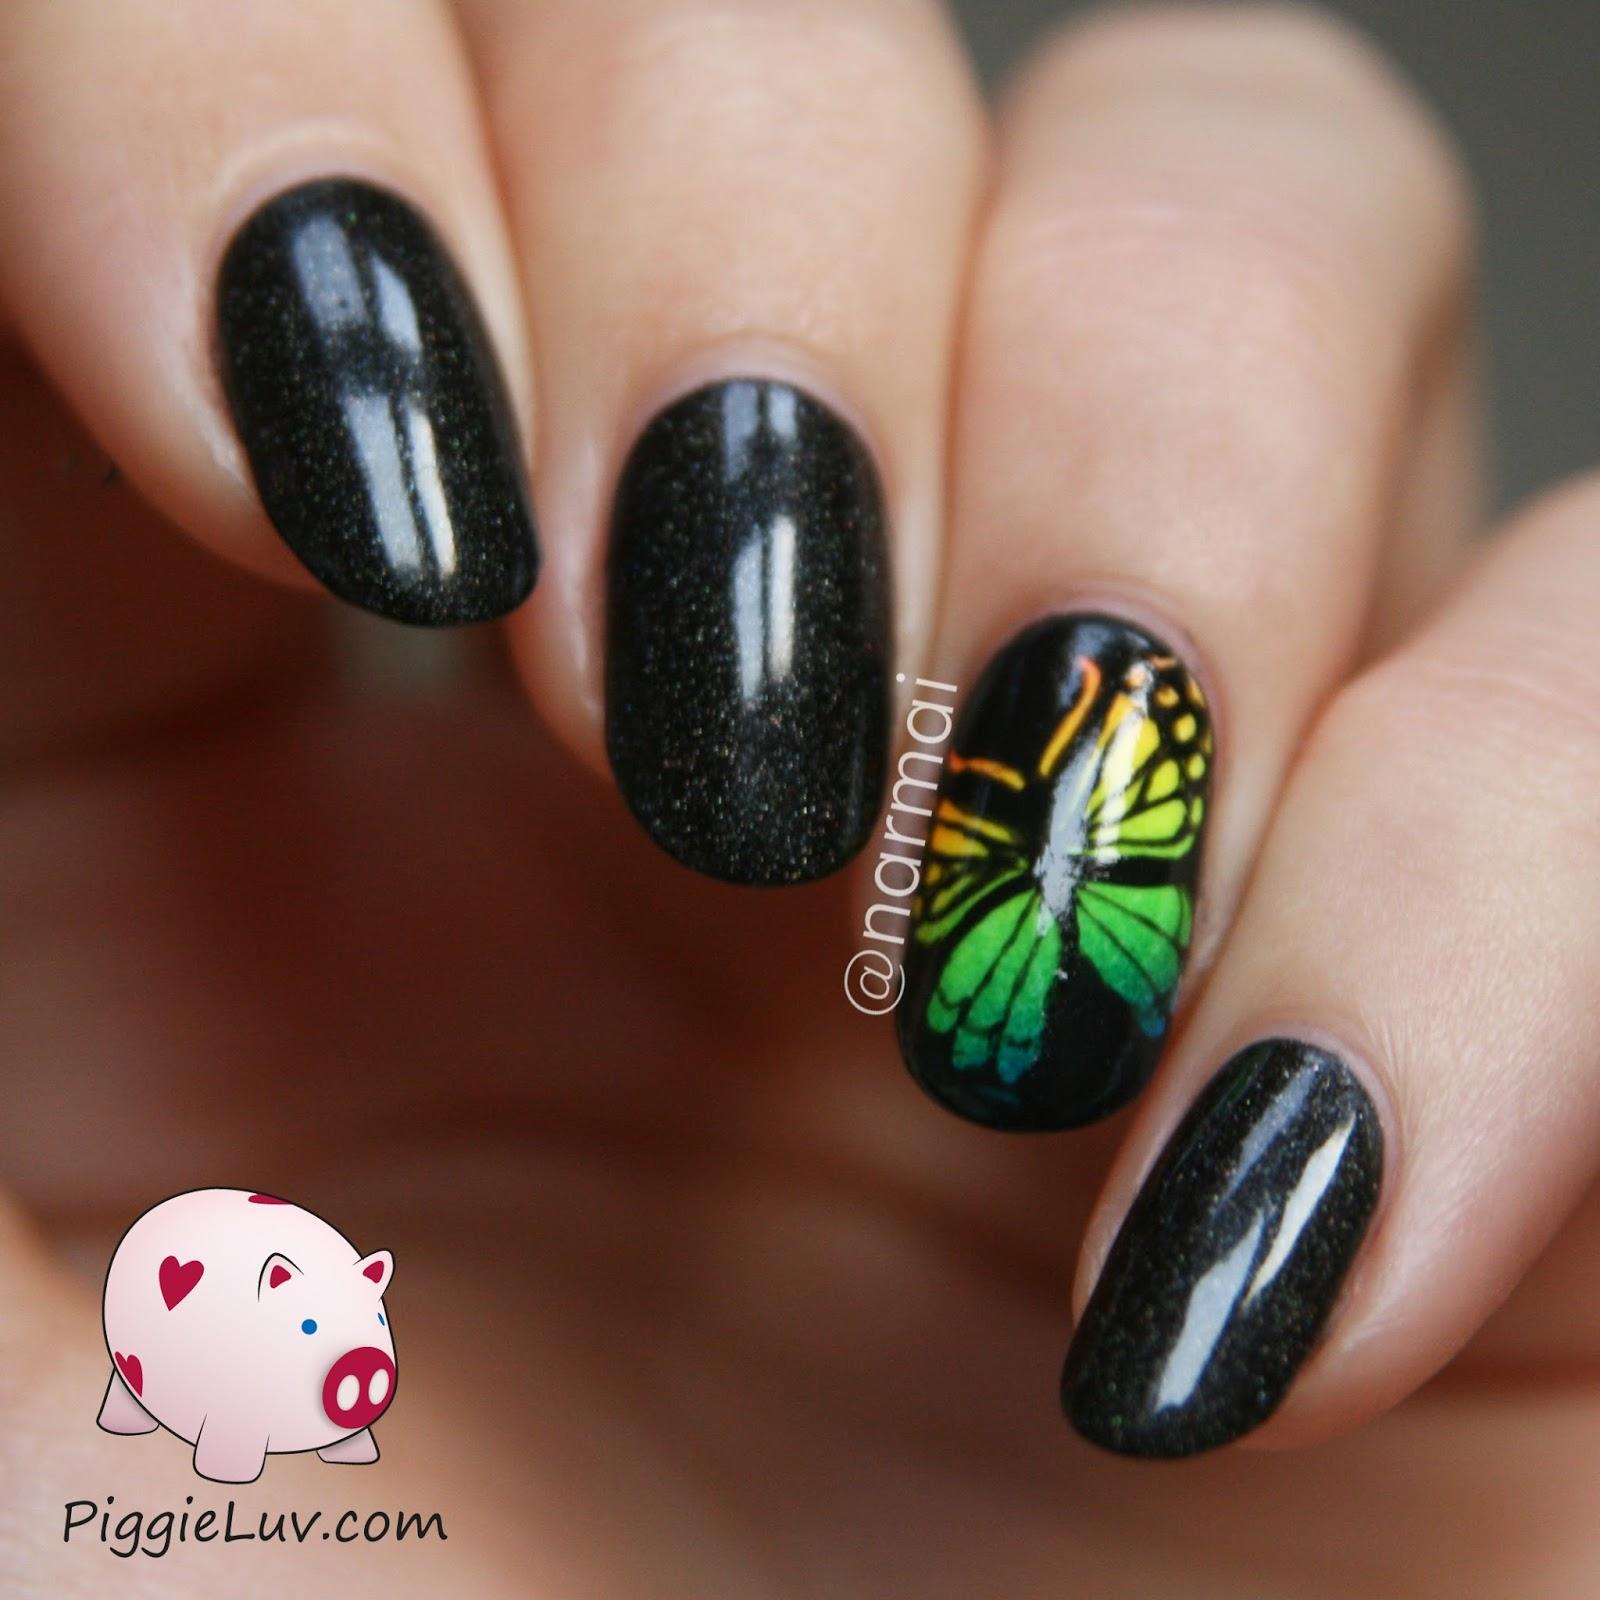 Piggieluv Rainbow Bubbles Nail Art: PiggieLuv: Rainbow Butterfly Accent Nail + Video Tutorial